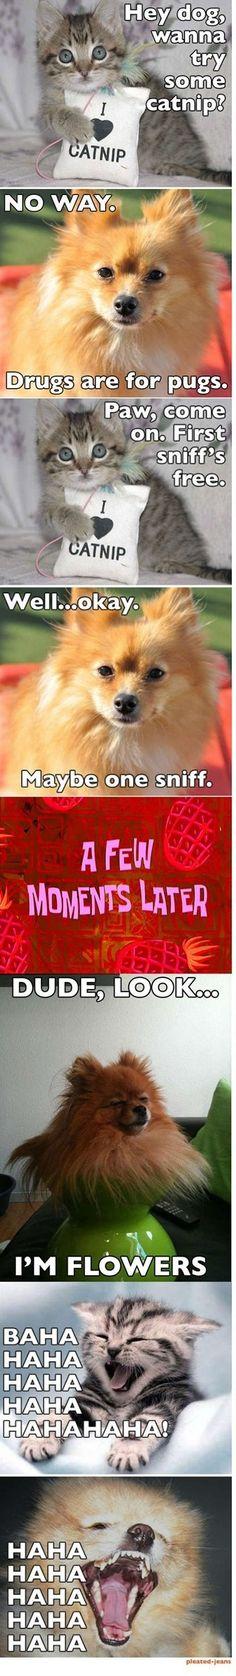 Pomeranian on catnip